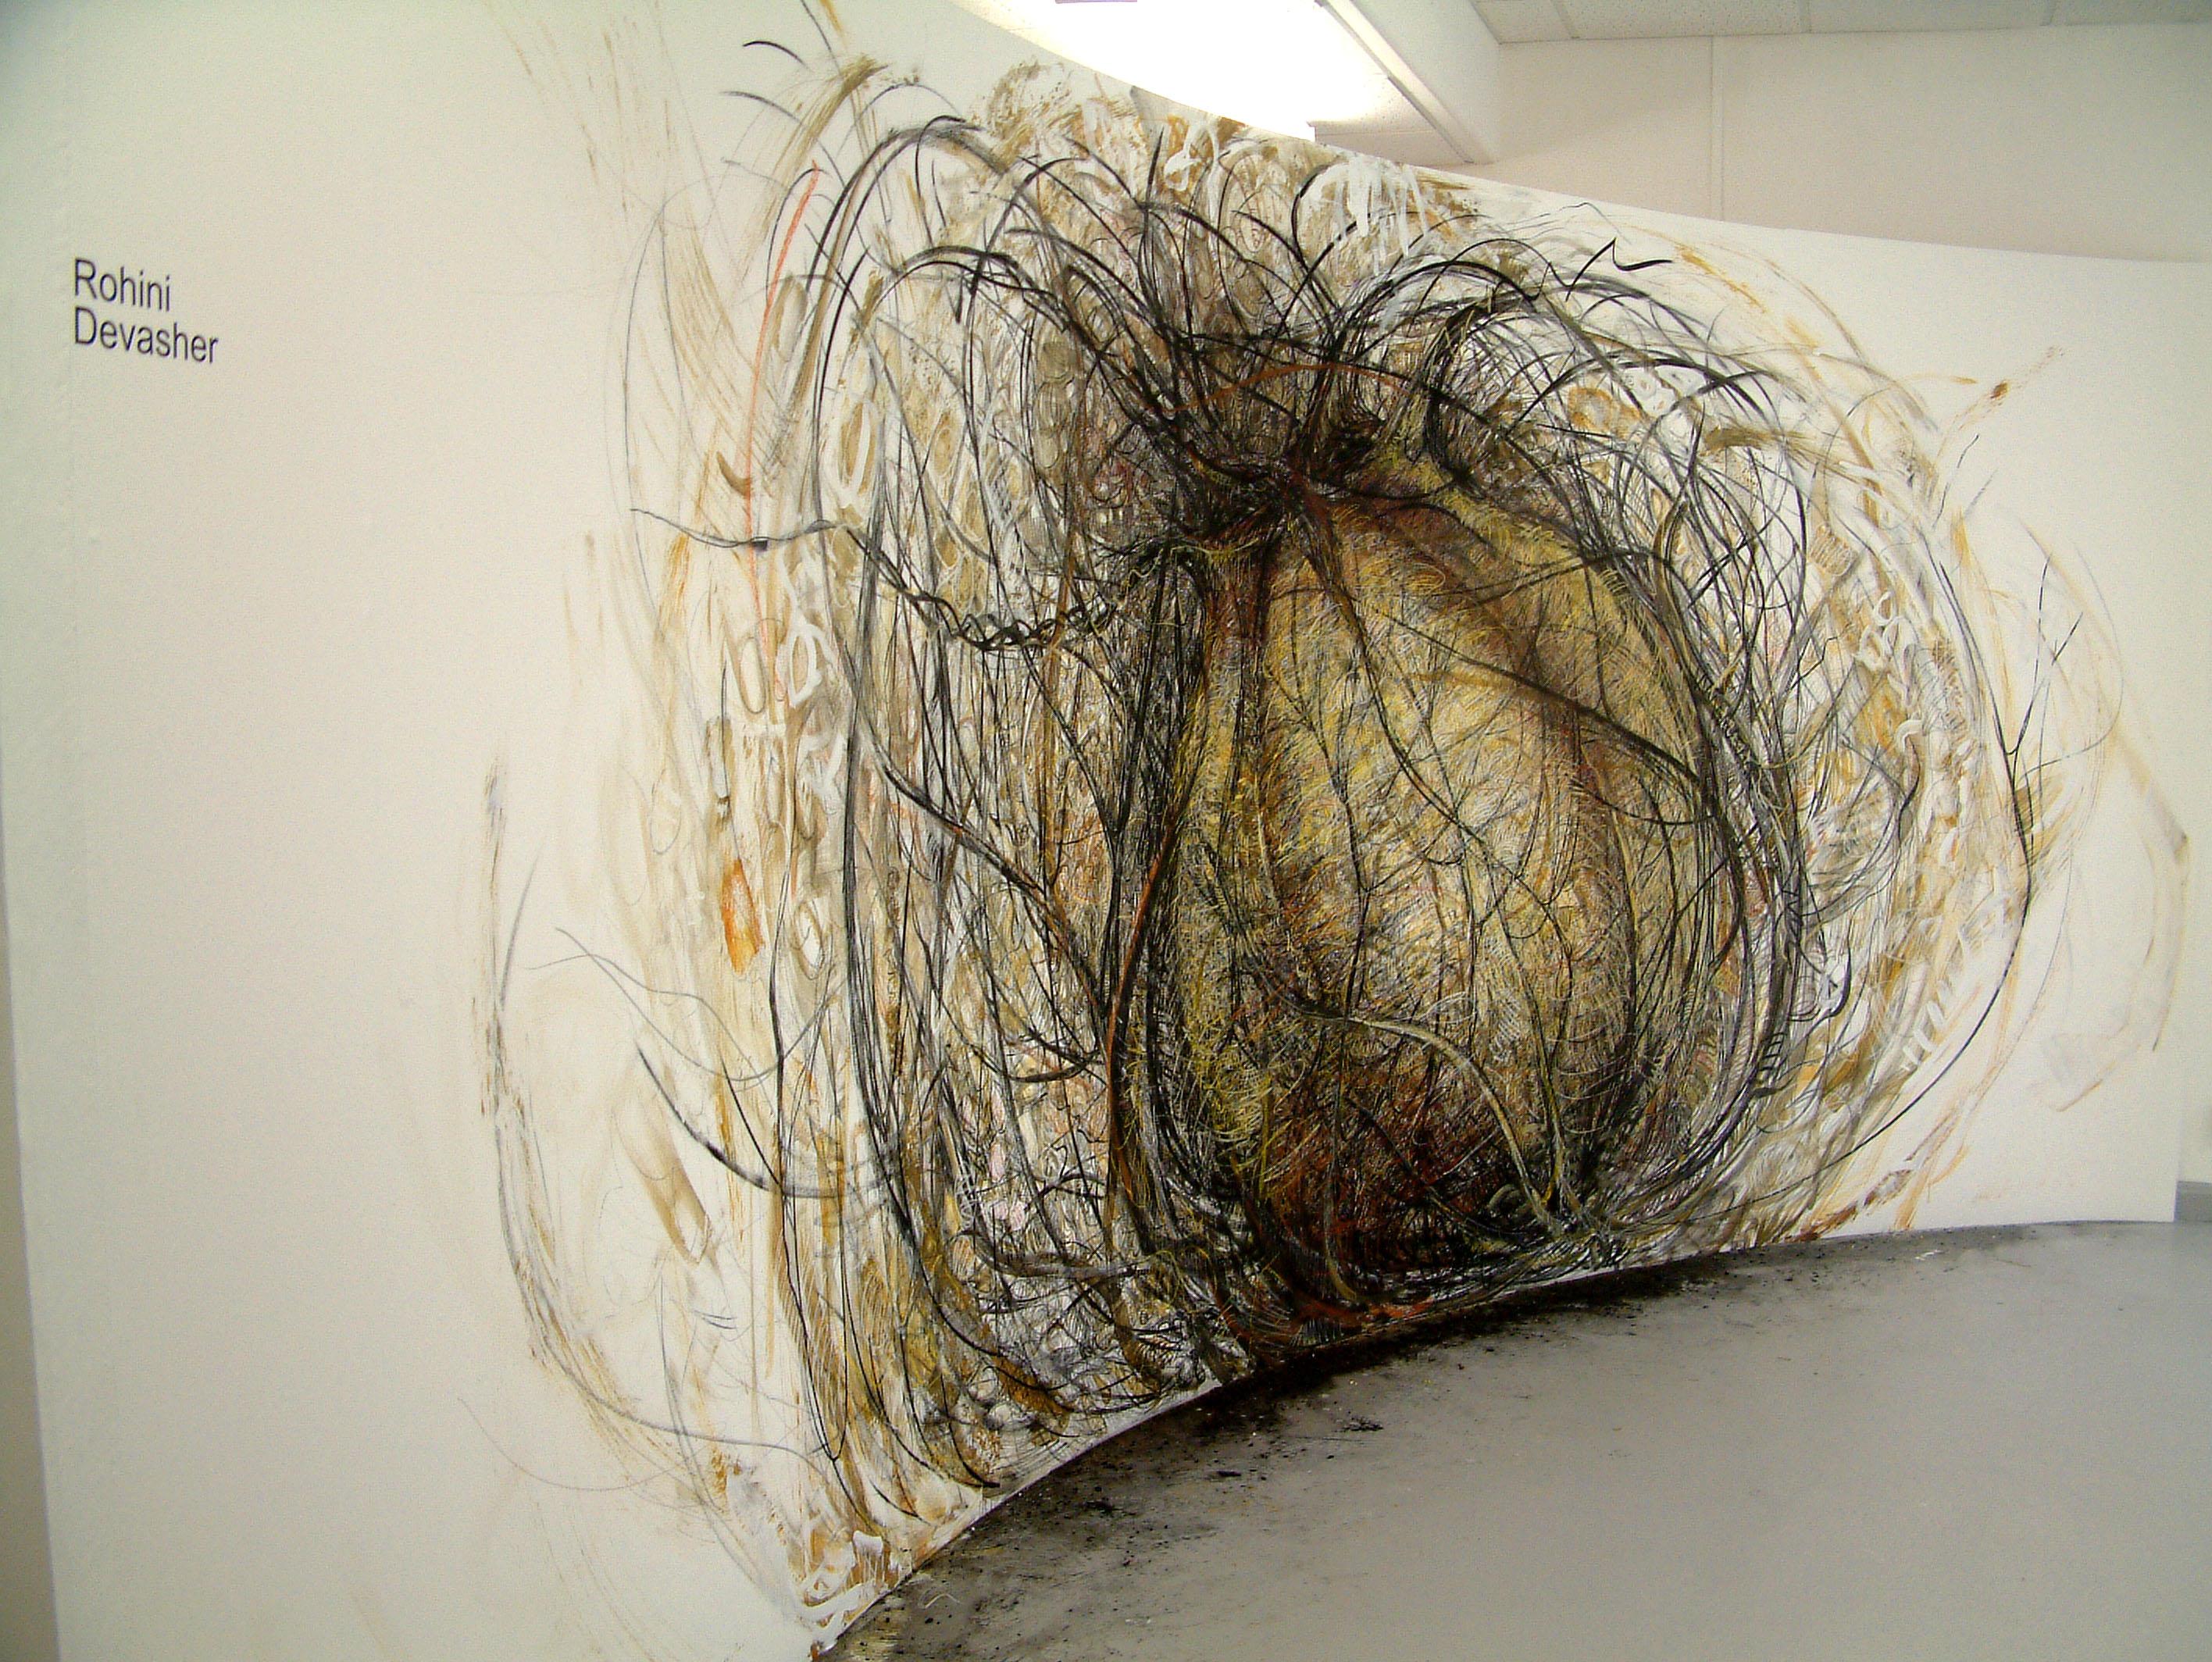 rohini-devasher-copyright-seed-wall-drawing-2004 (3)